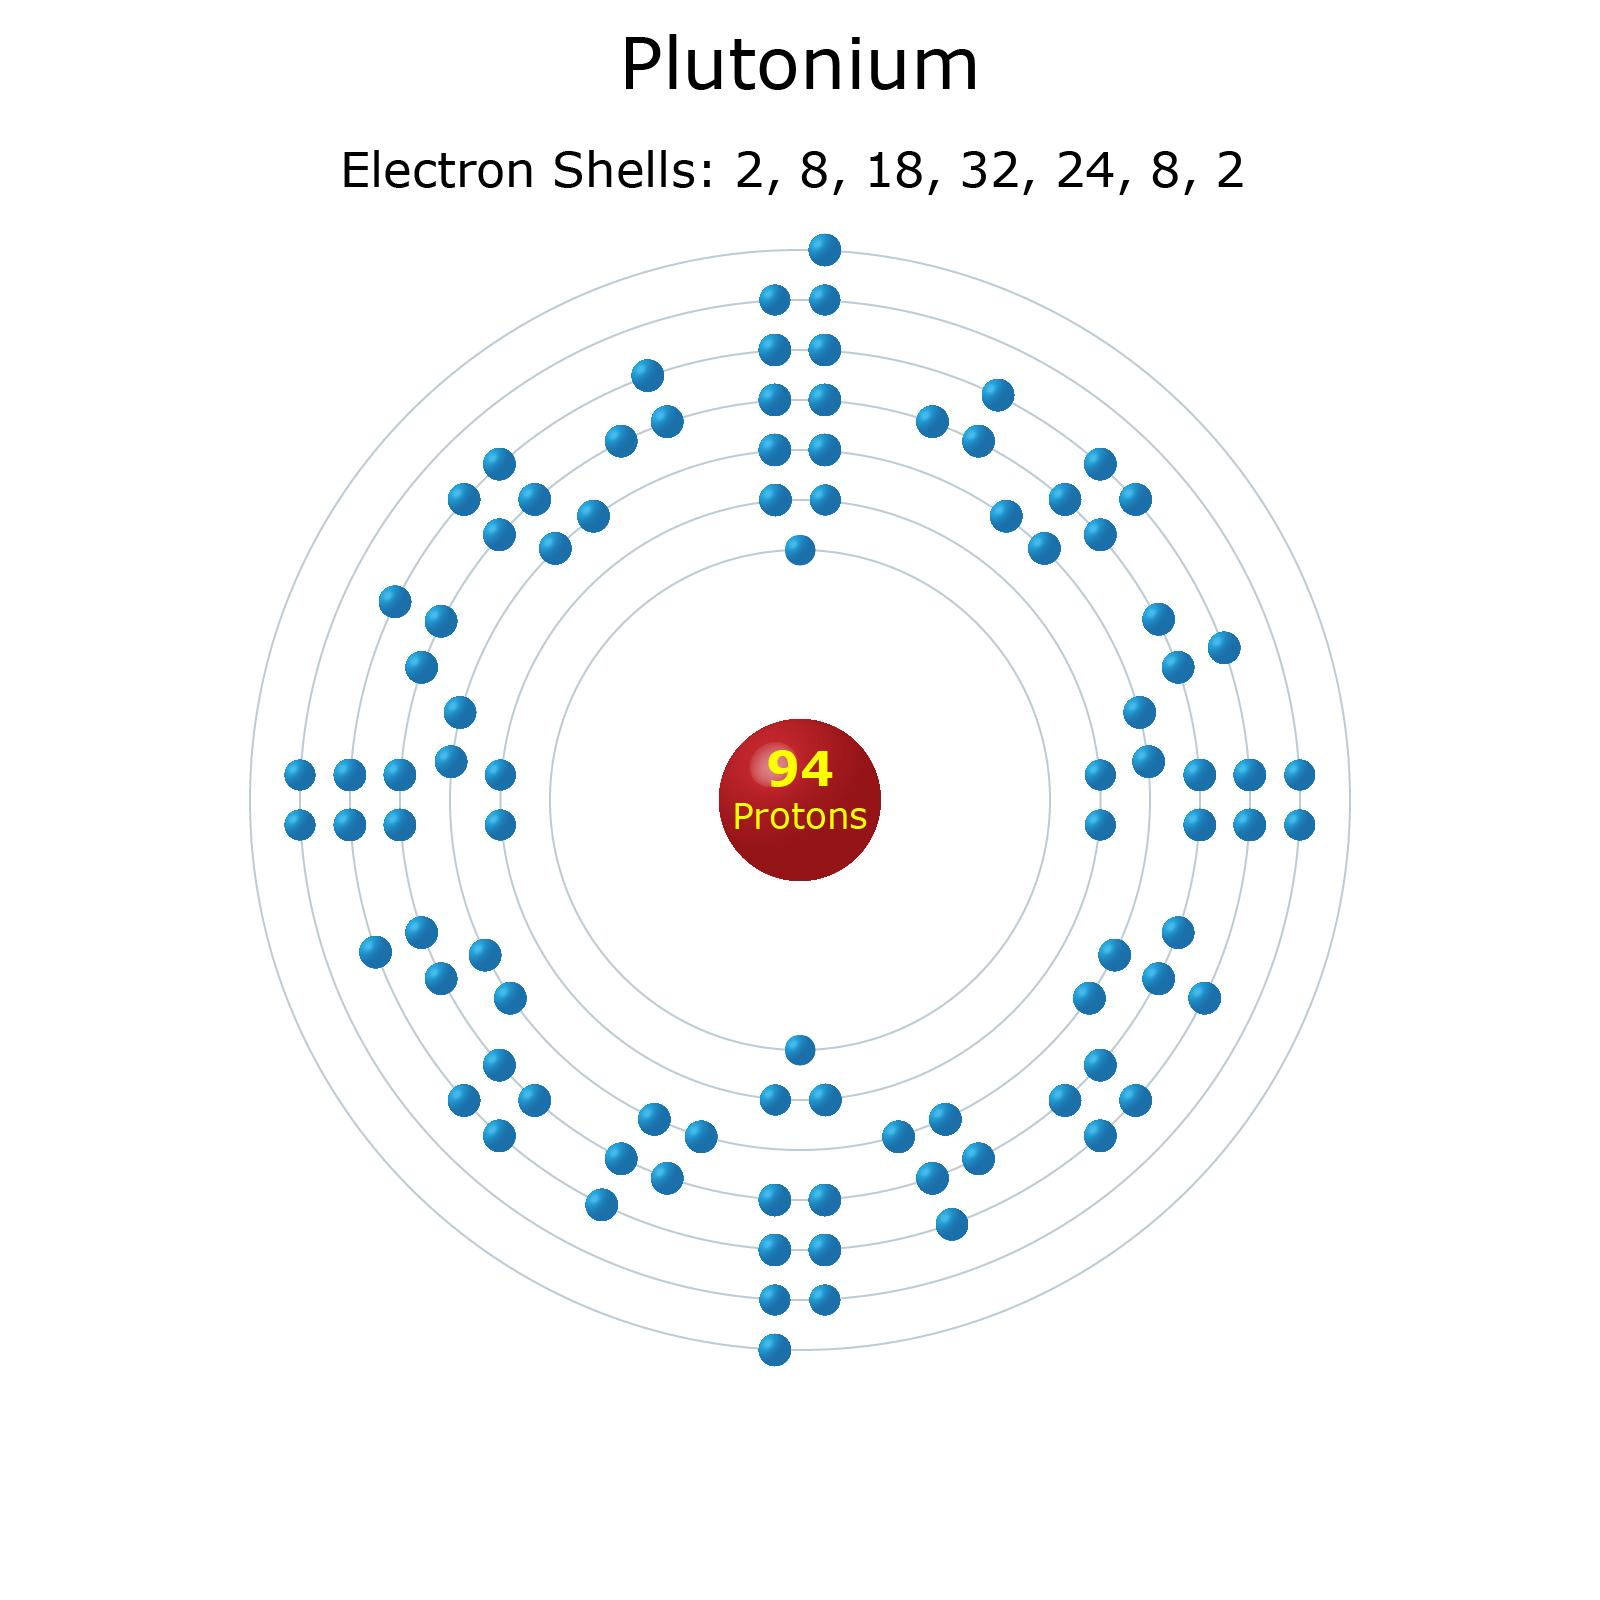 hight resolution of  plutonium bohr model diagram for element all kind of wiring diagrams u2022 lanthanum bohr model